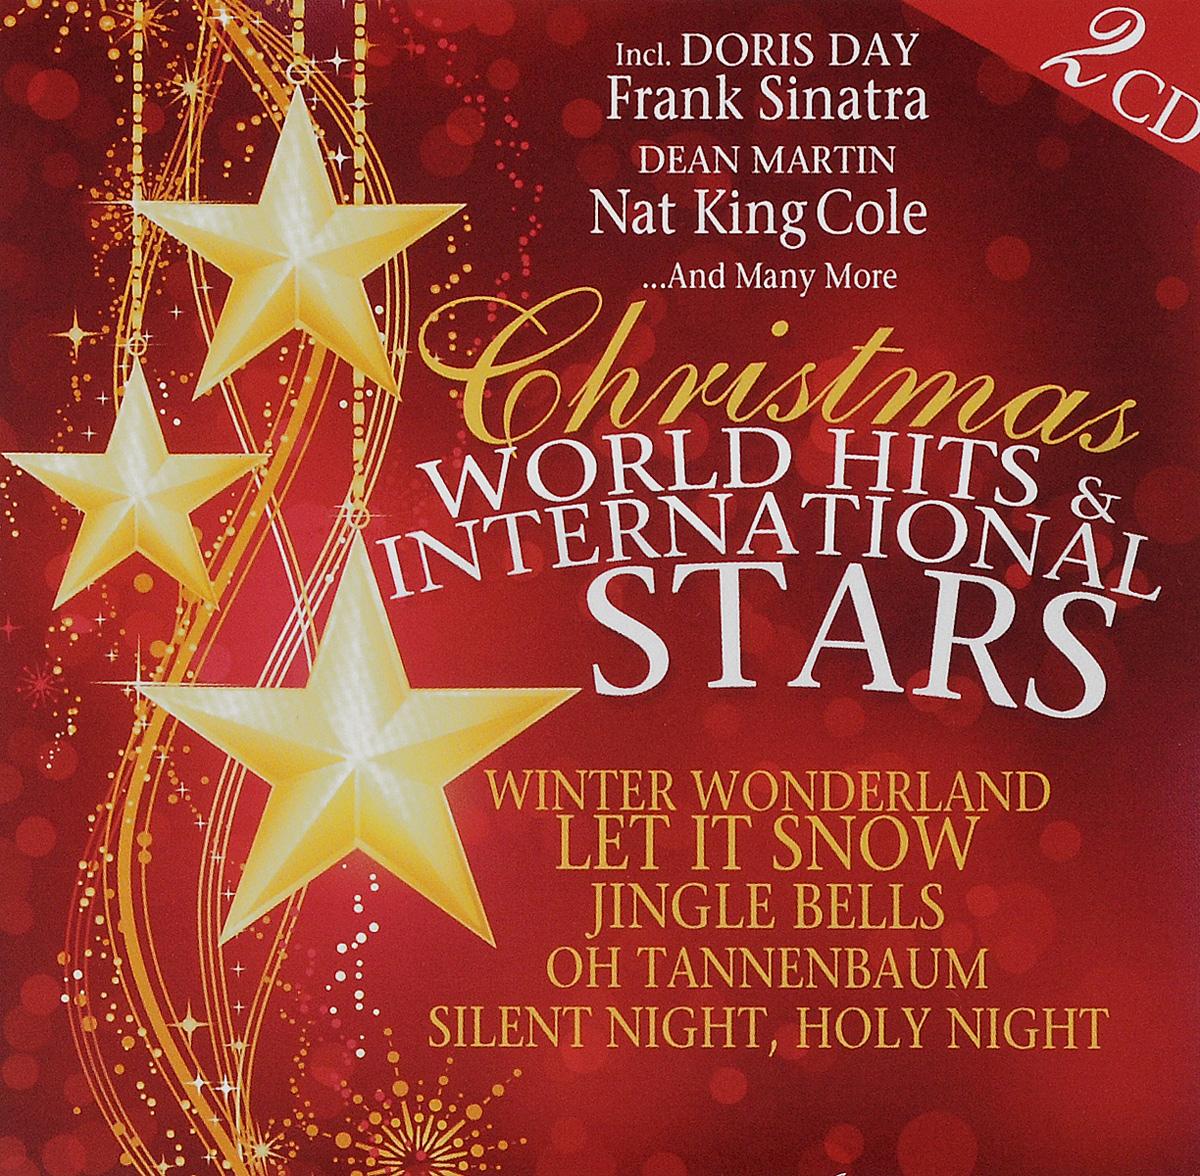 Фрэнк Синатра Christmas World Hits & Internationale Stars (2 CD)